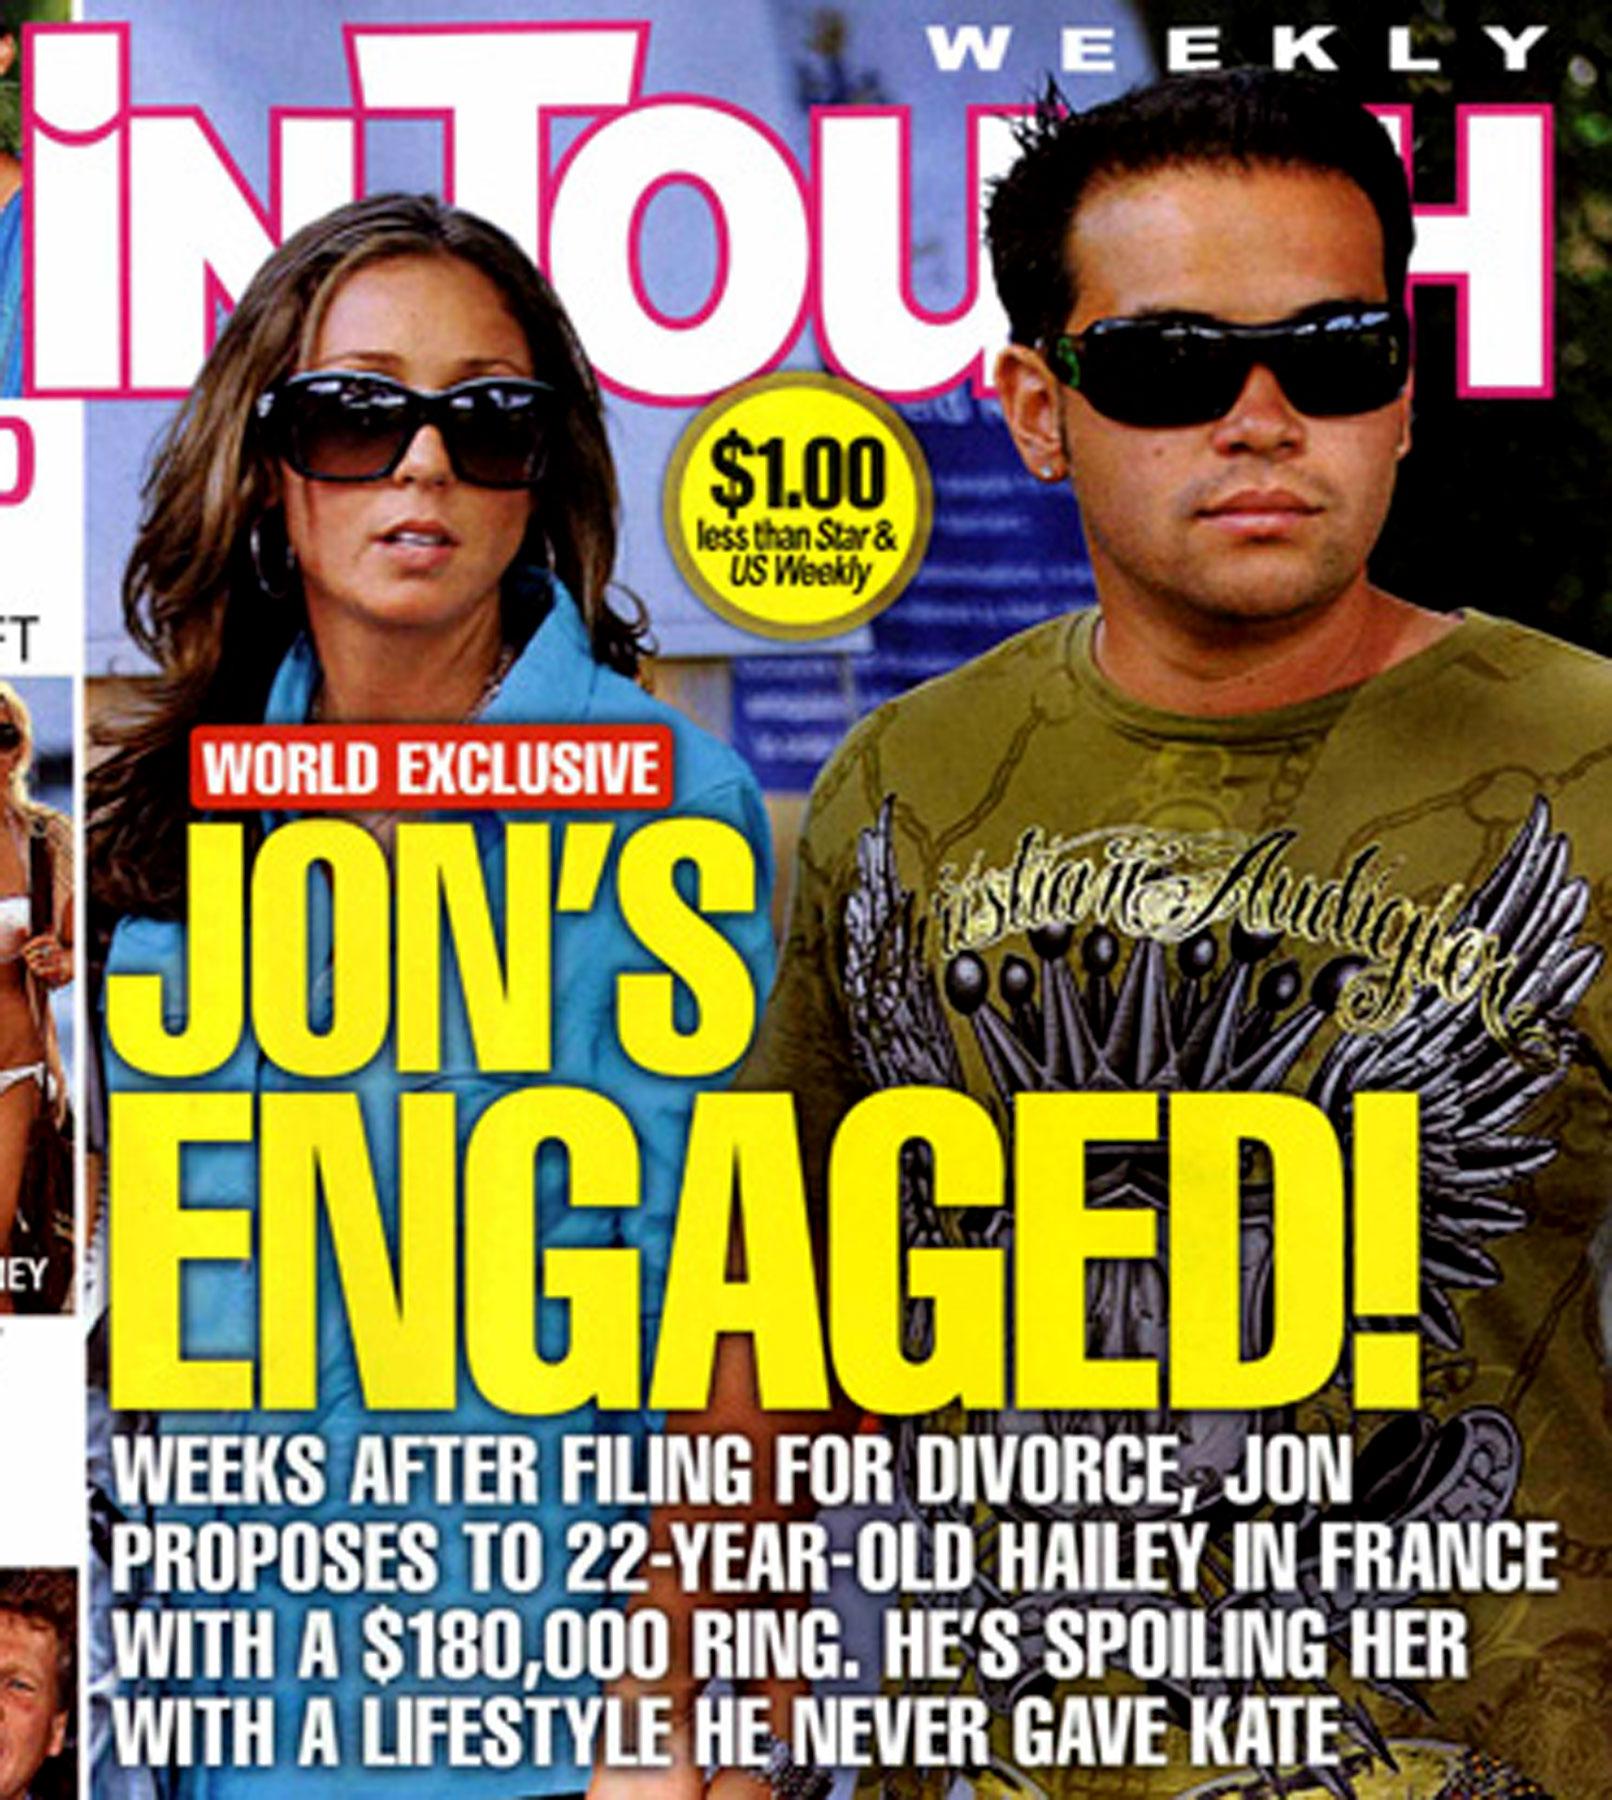 Jon Gosselin: Engaged to Hailey Glassman Already?